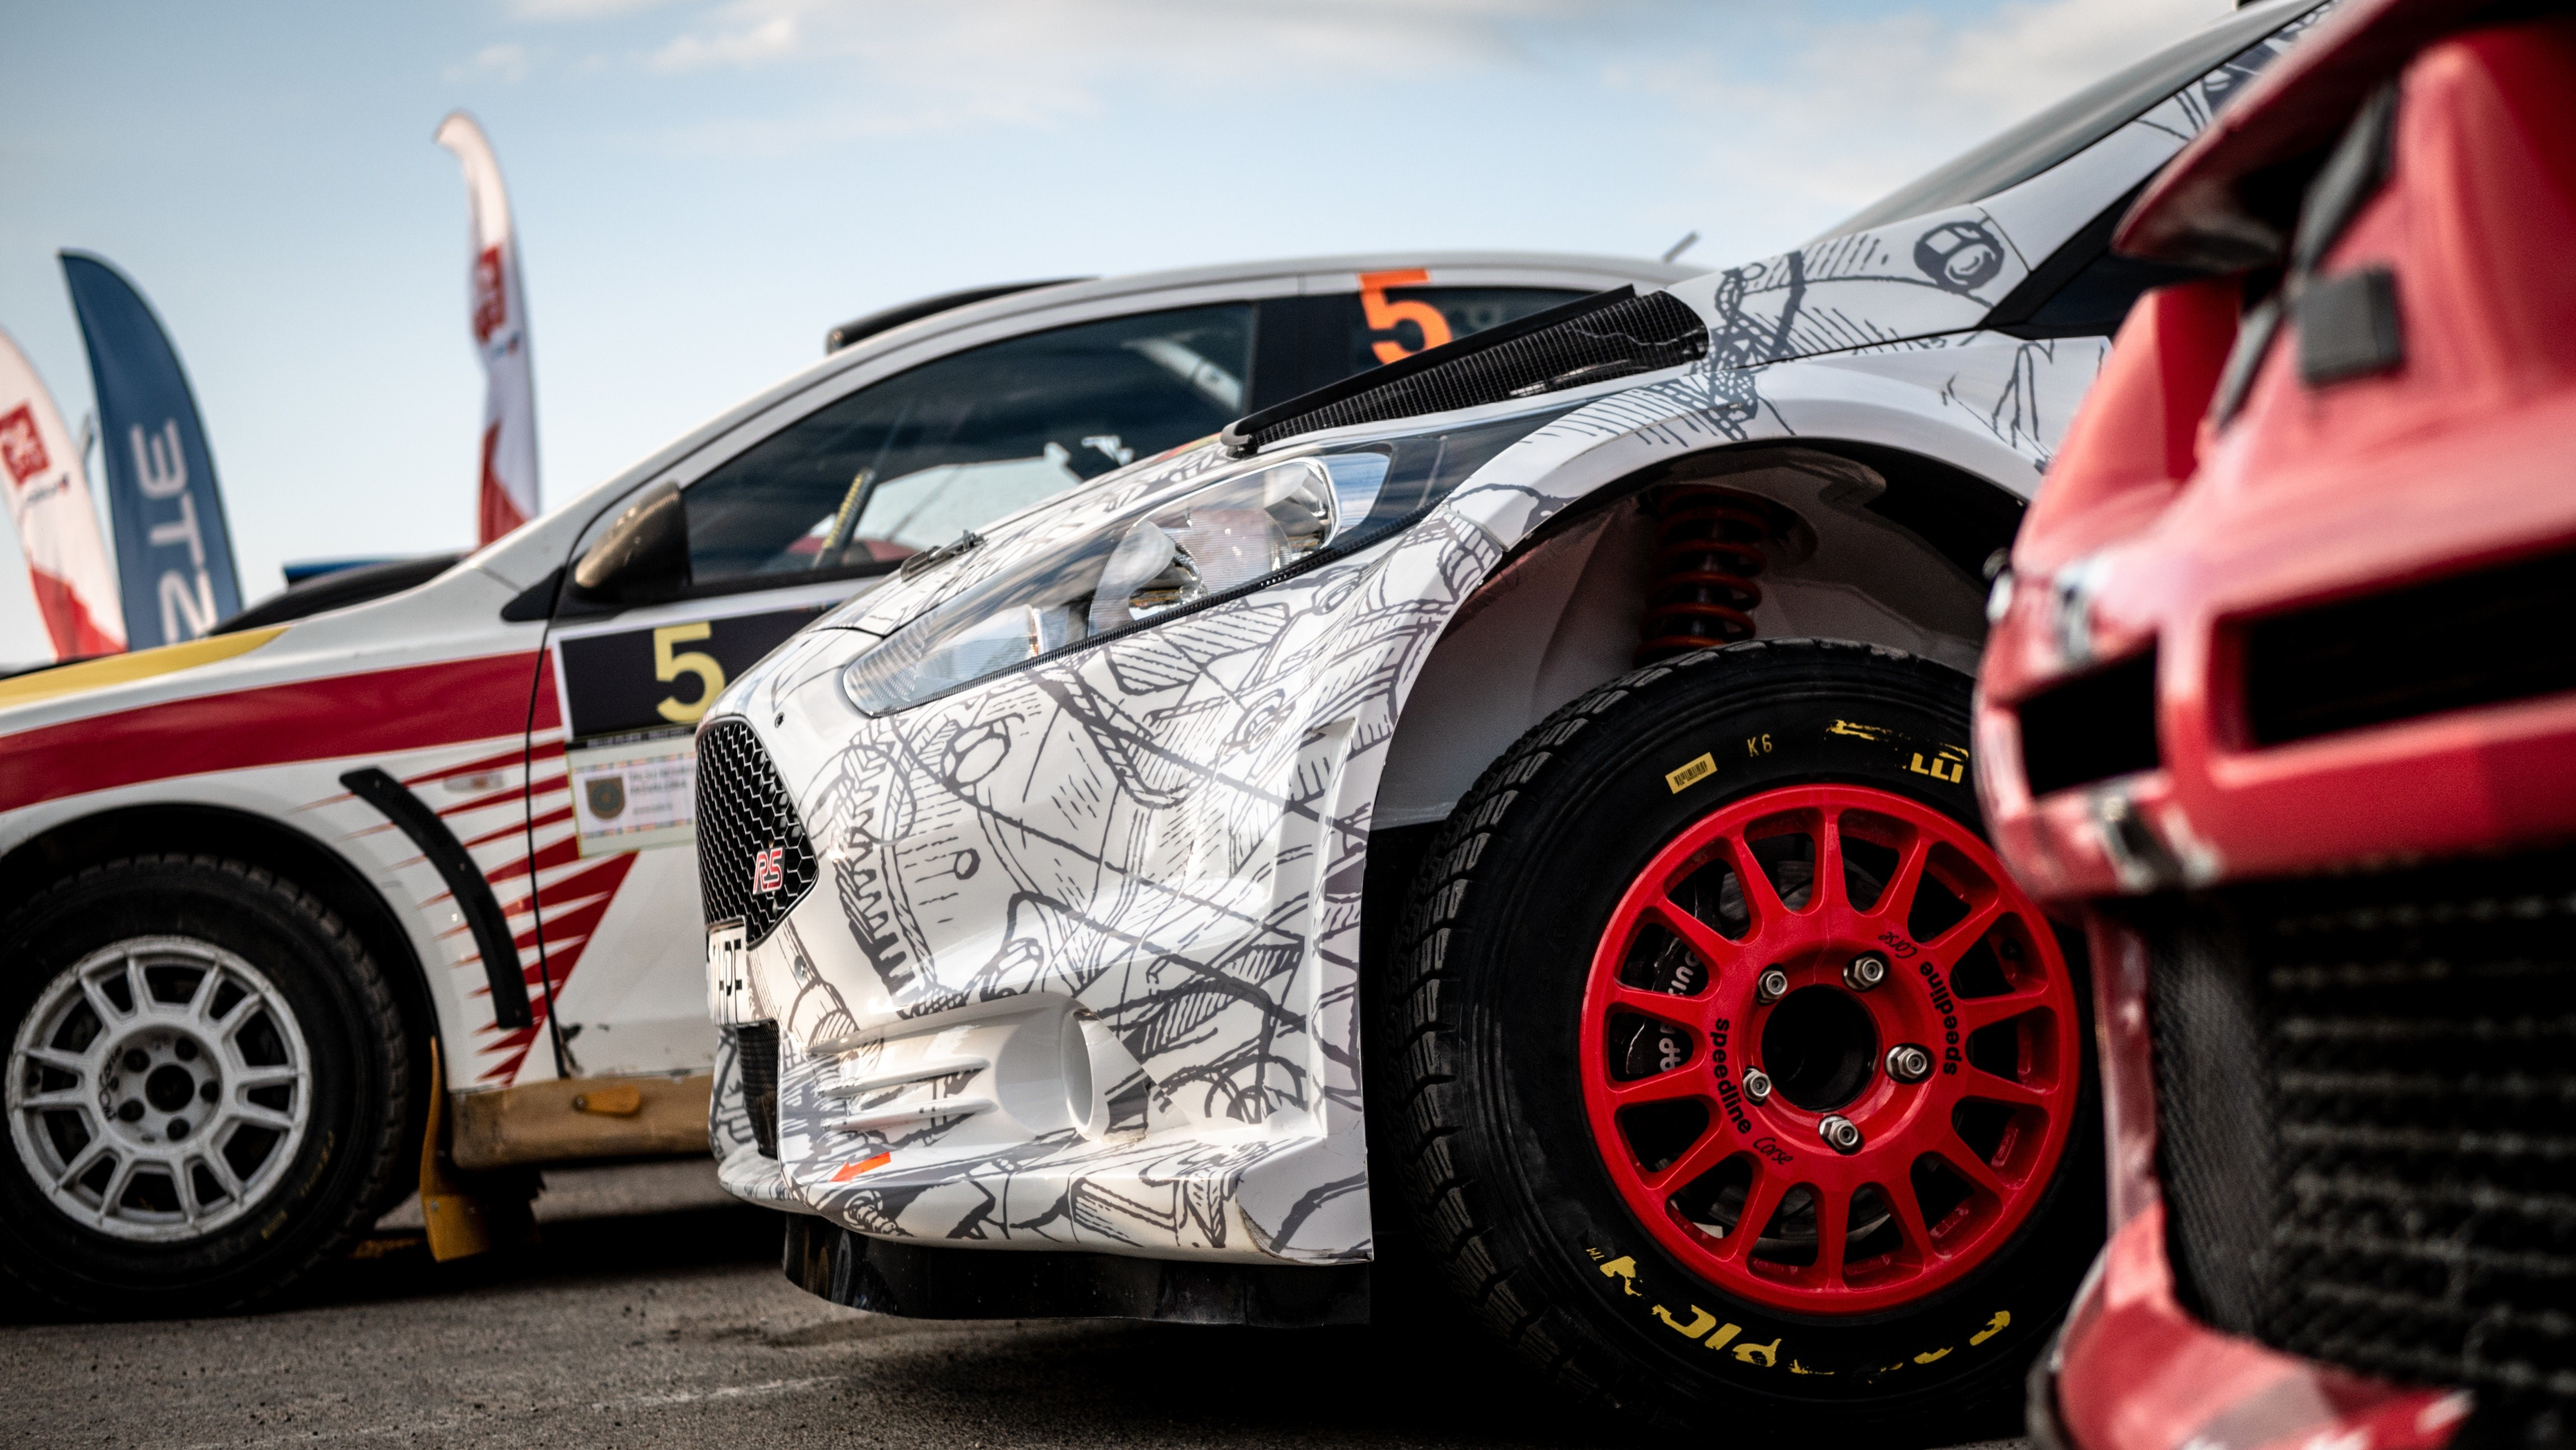 Rally Cars For Sale >> Rally Cars For Sale Linkedin